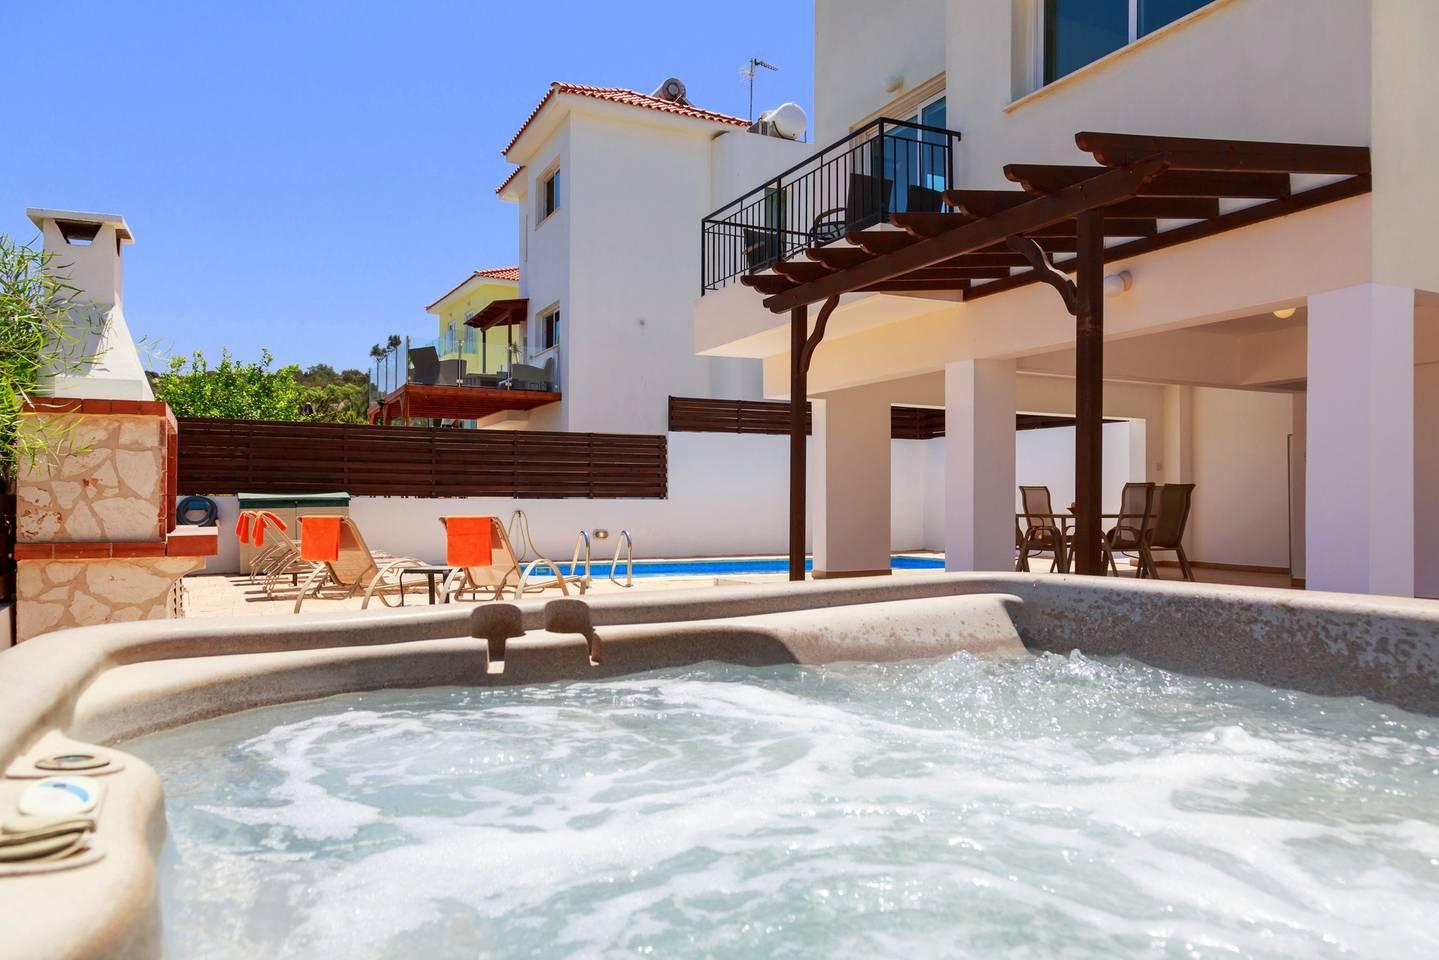 Apartment Villa Elias - 2 Bedrooms - Private Pool   Hot Tub photo 19061707